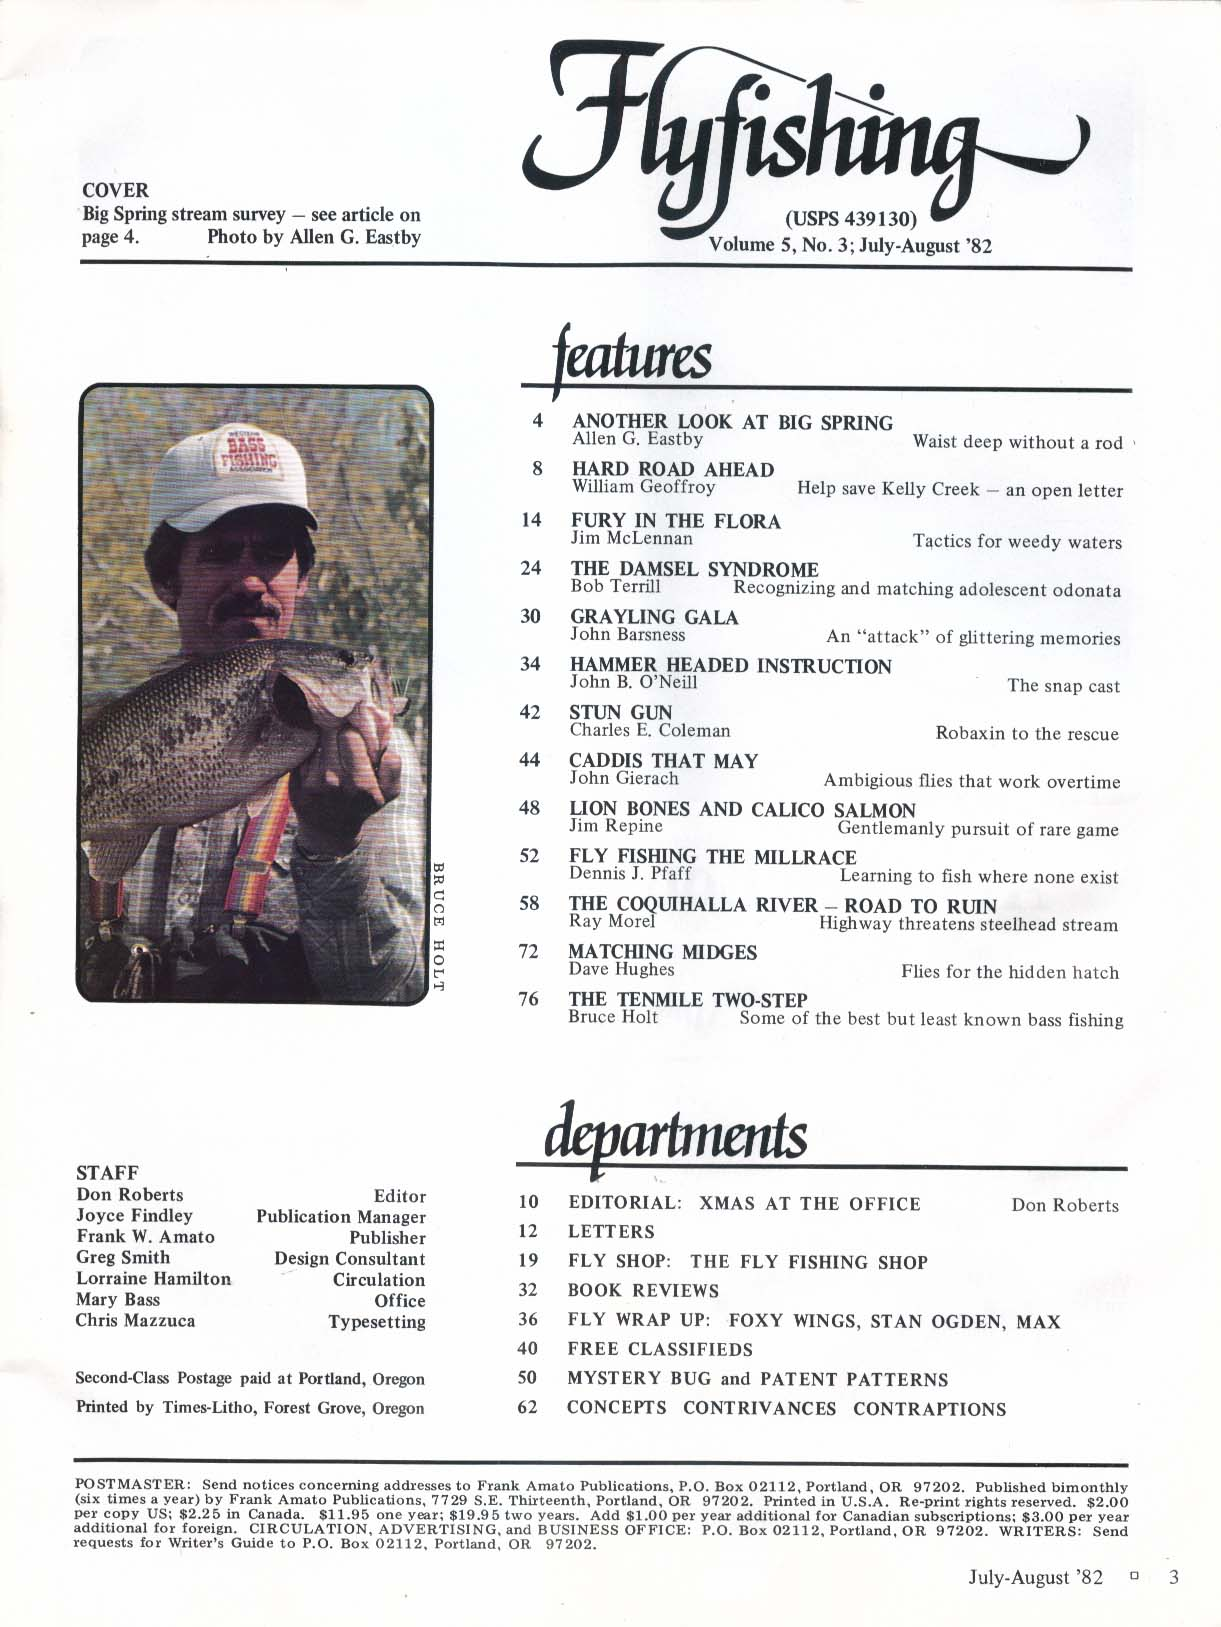 FLYFISHING Rapid Nymphing Gamefish Lochsa River 6 1982